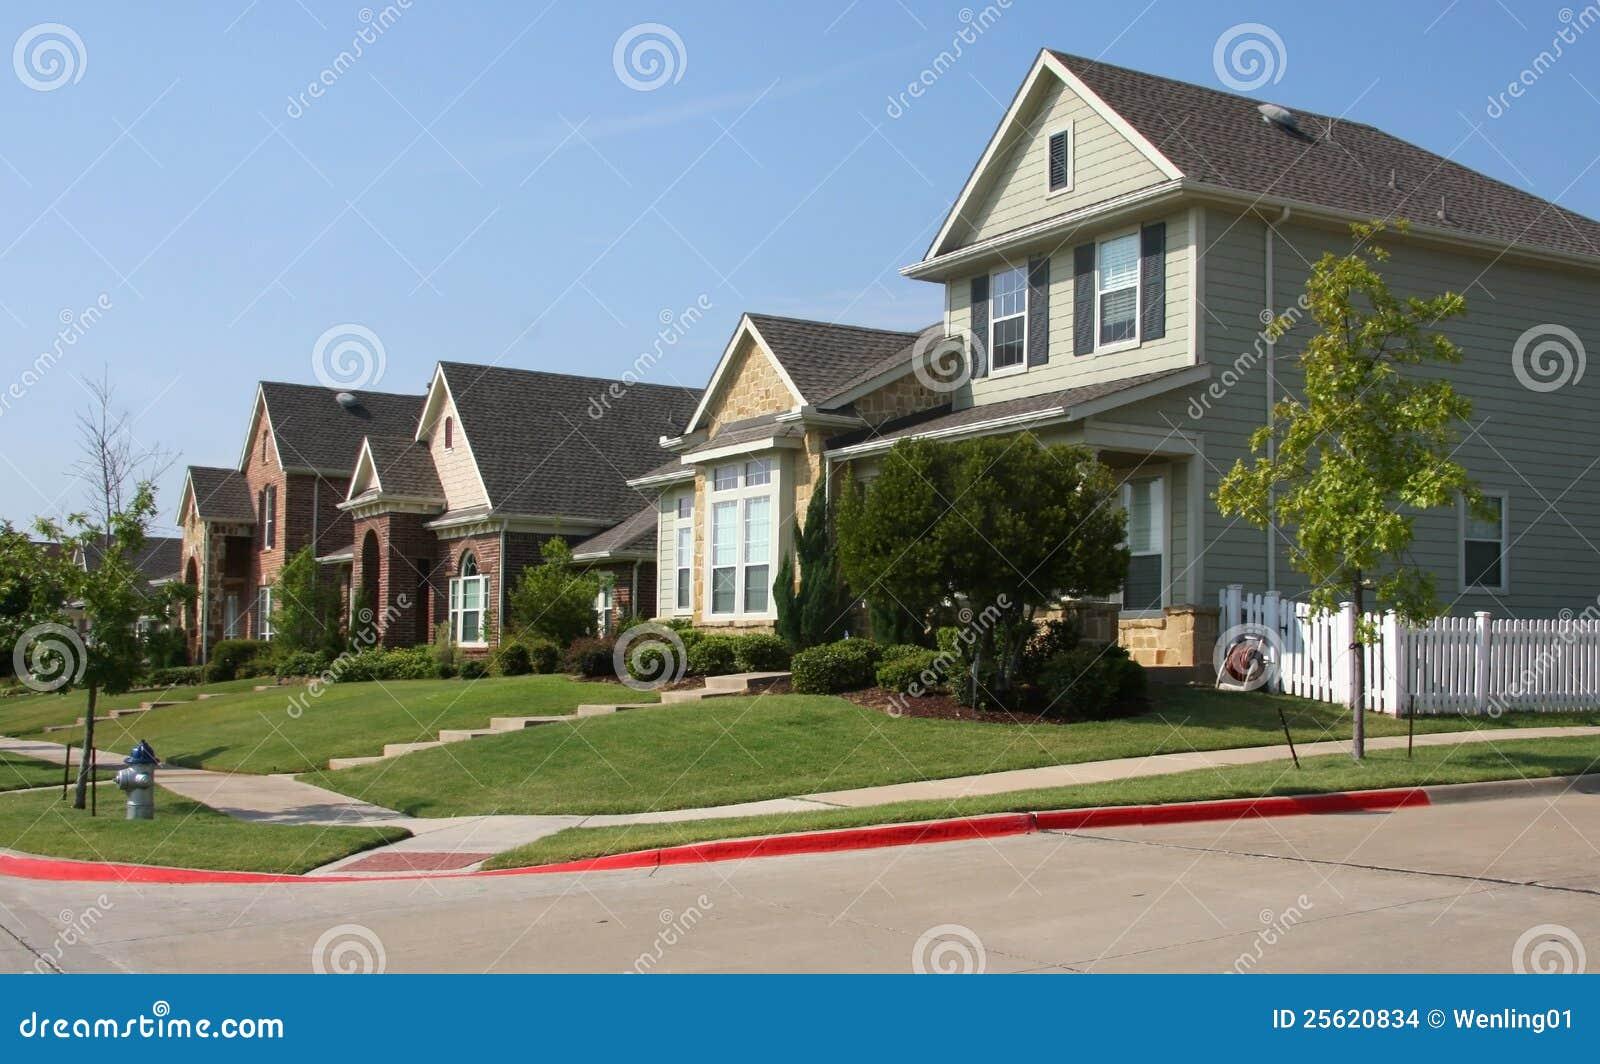 New neighborhood building in countryside